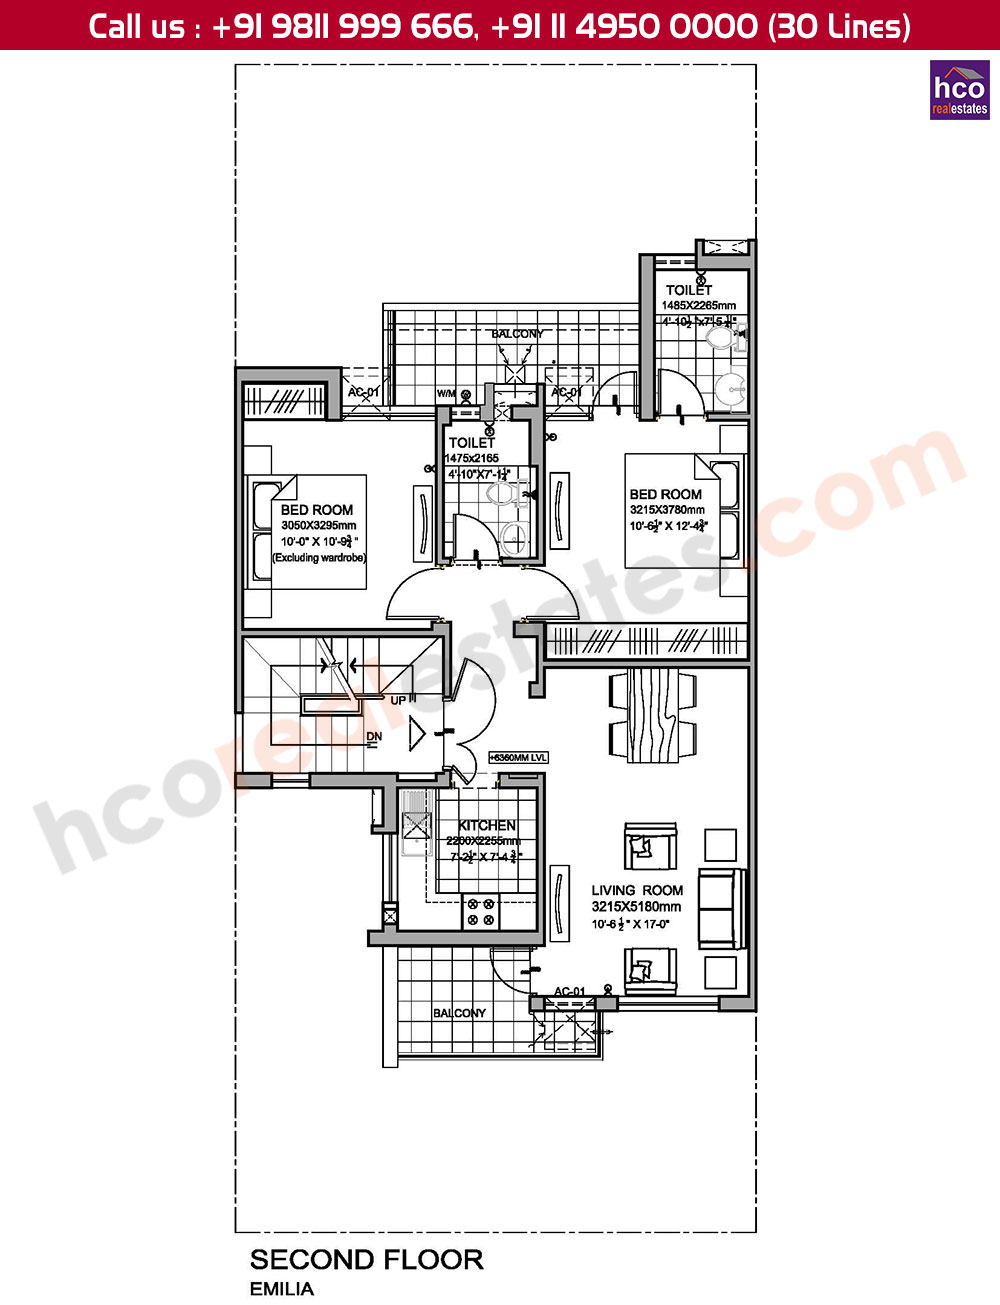 Floor Plan Vatika Emilia Gurgaon Sector 82 Amp 83